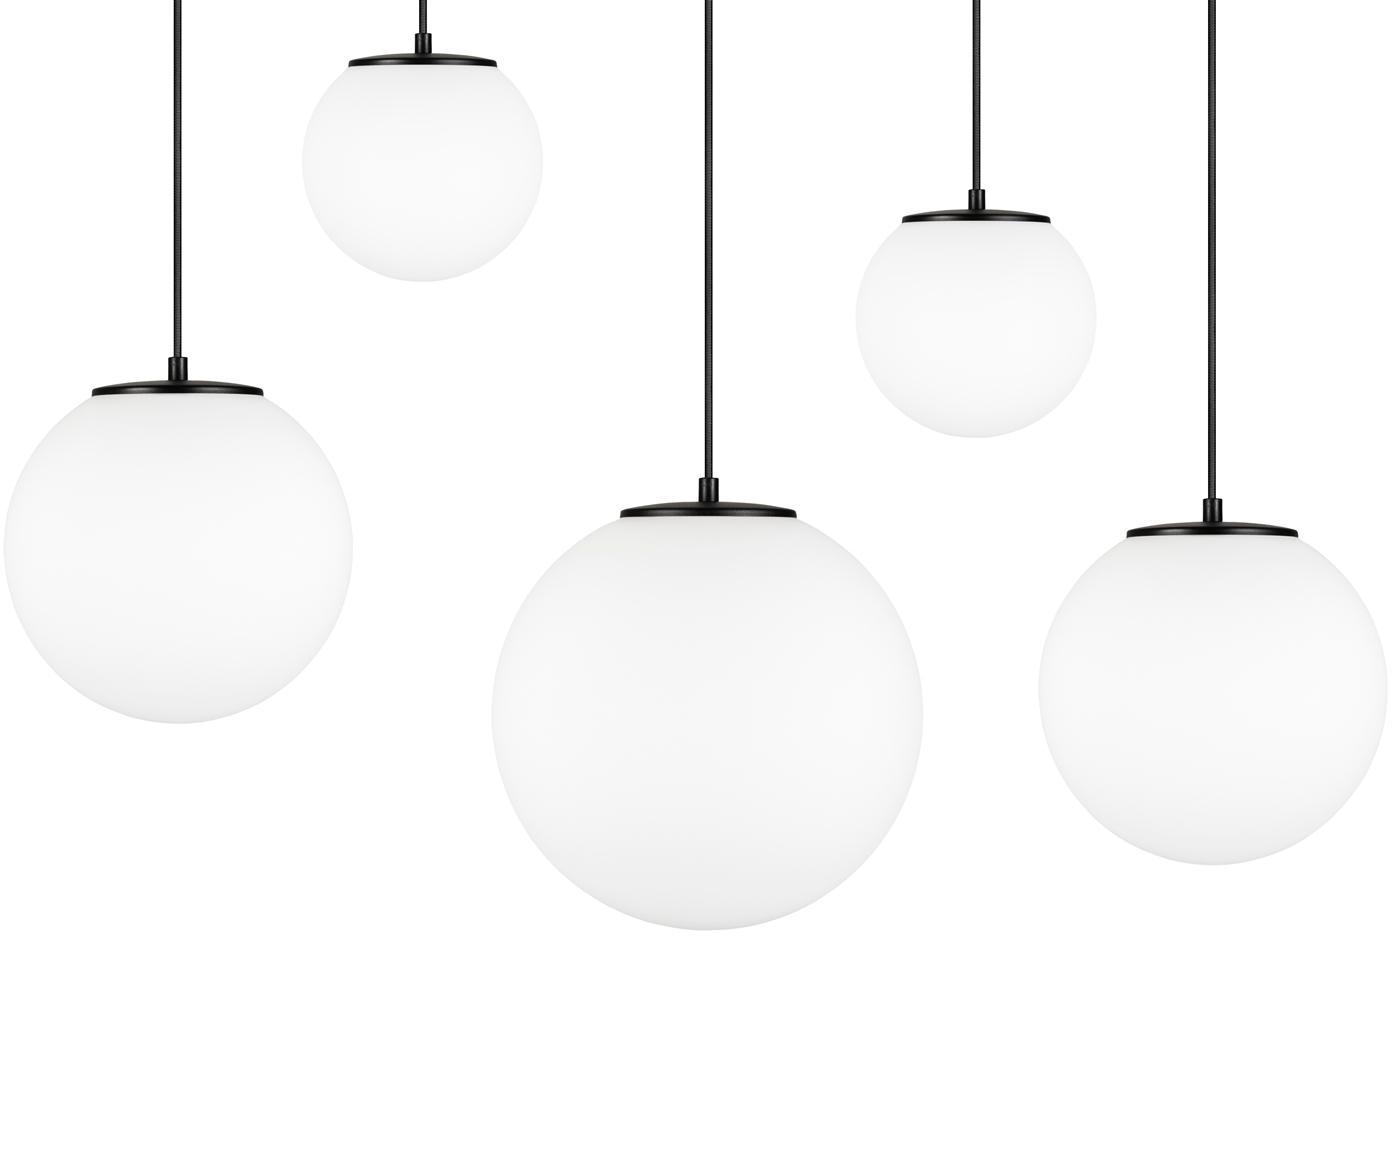 Hanglamp  met bollen Tsuki van opaalglas, Lampenkap: opaalglas, Opaalwit, zwart, 95 x 166 cm